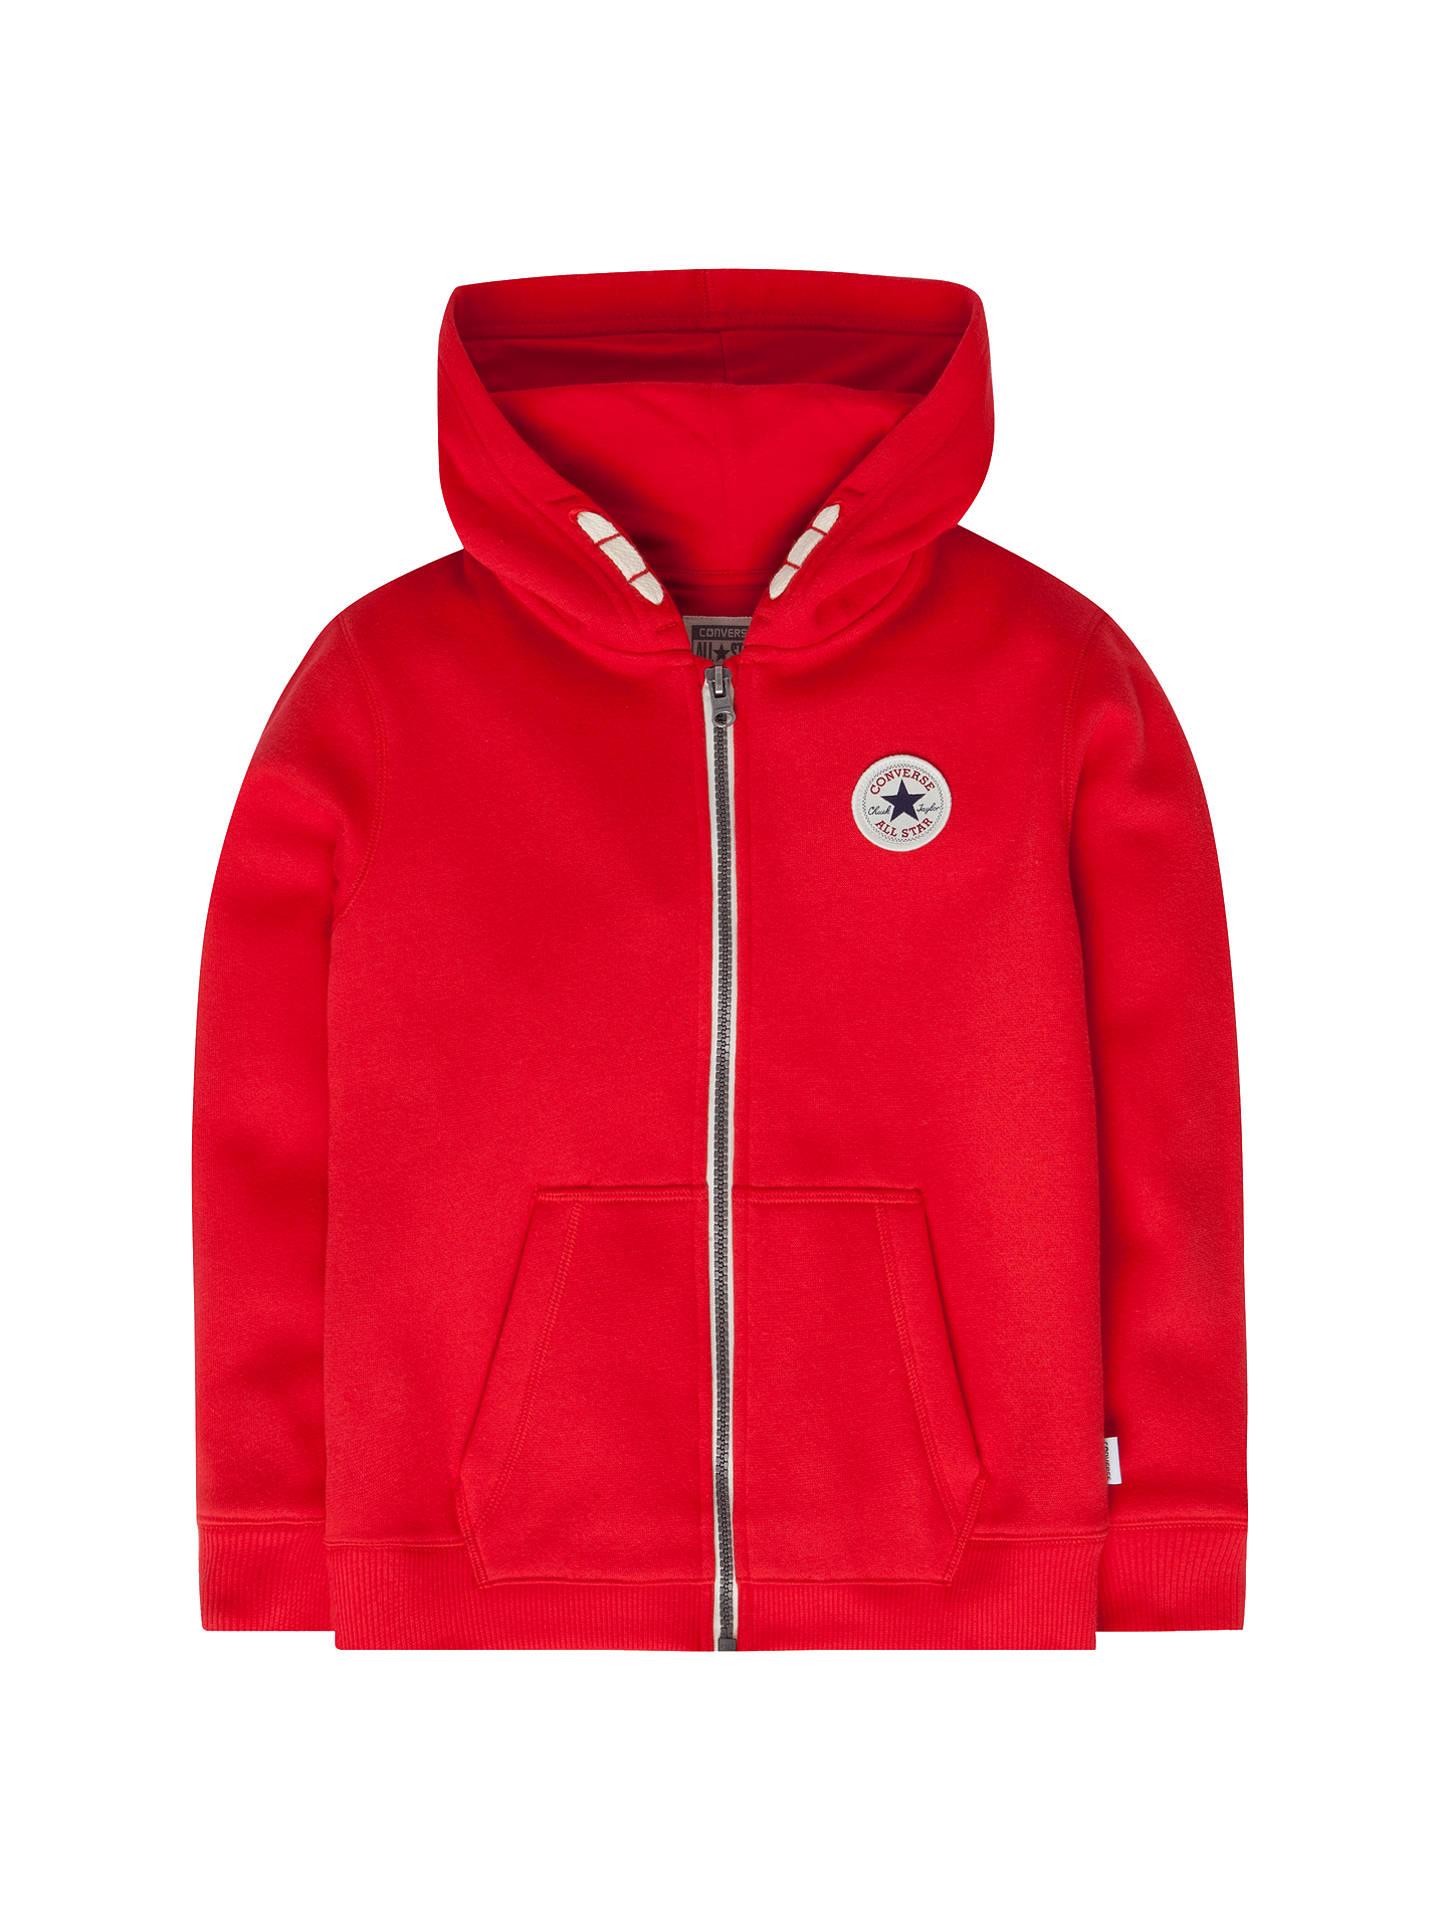 ebd953a9c612 Buy Converse Children s All Star Core Zip Hoodie